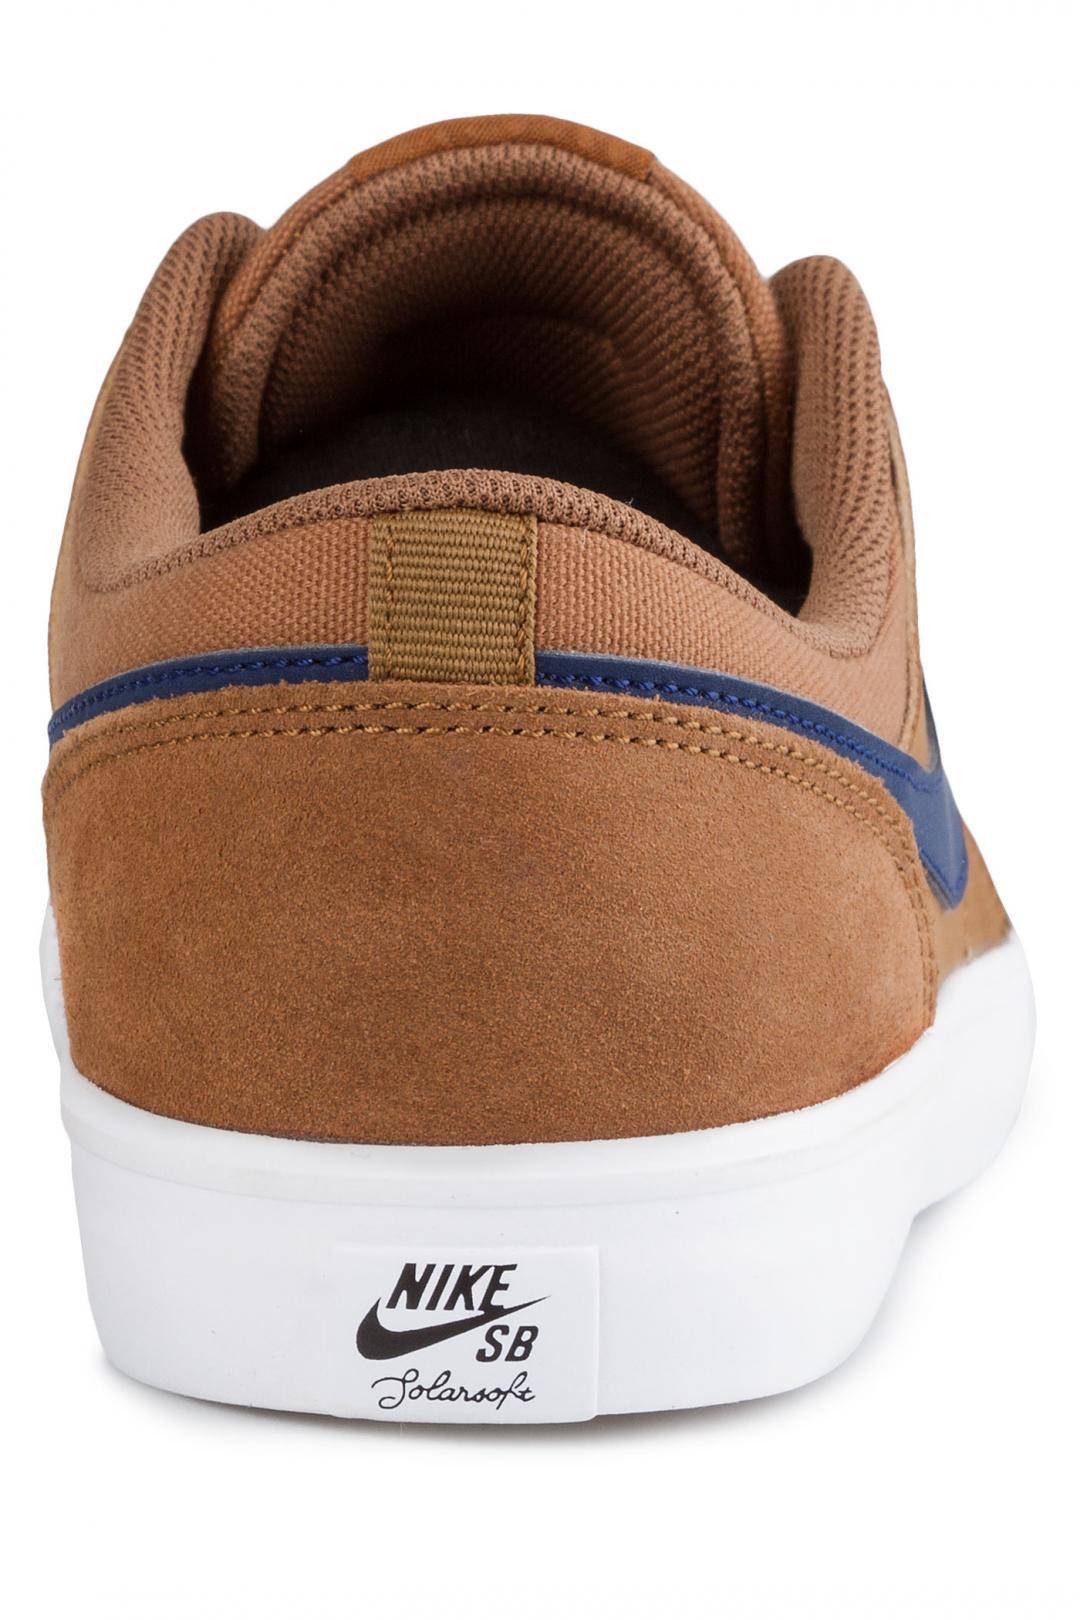 Uomo Nike SB Solarsoft Portmore II light british tan | Scarpe da skate